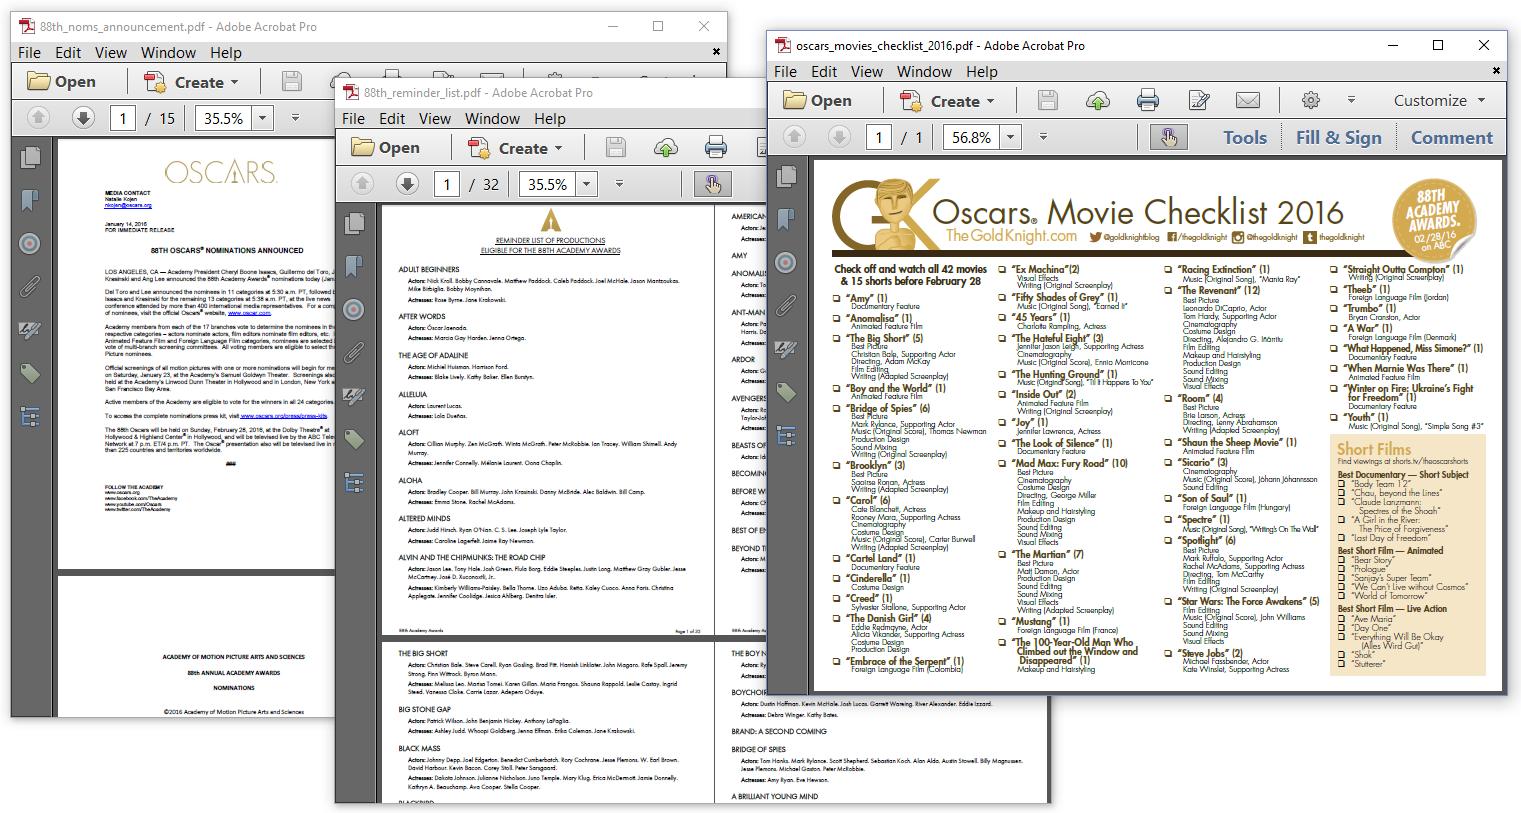 Figure 6.6: The Oscars, source documents